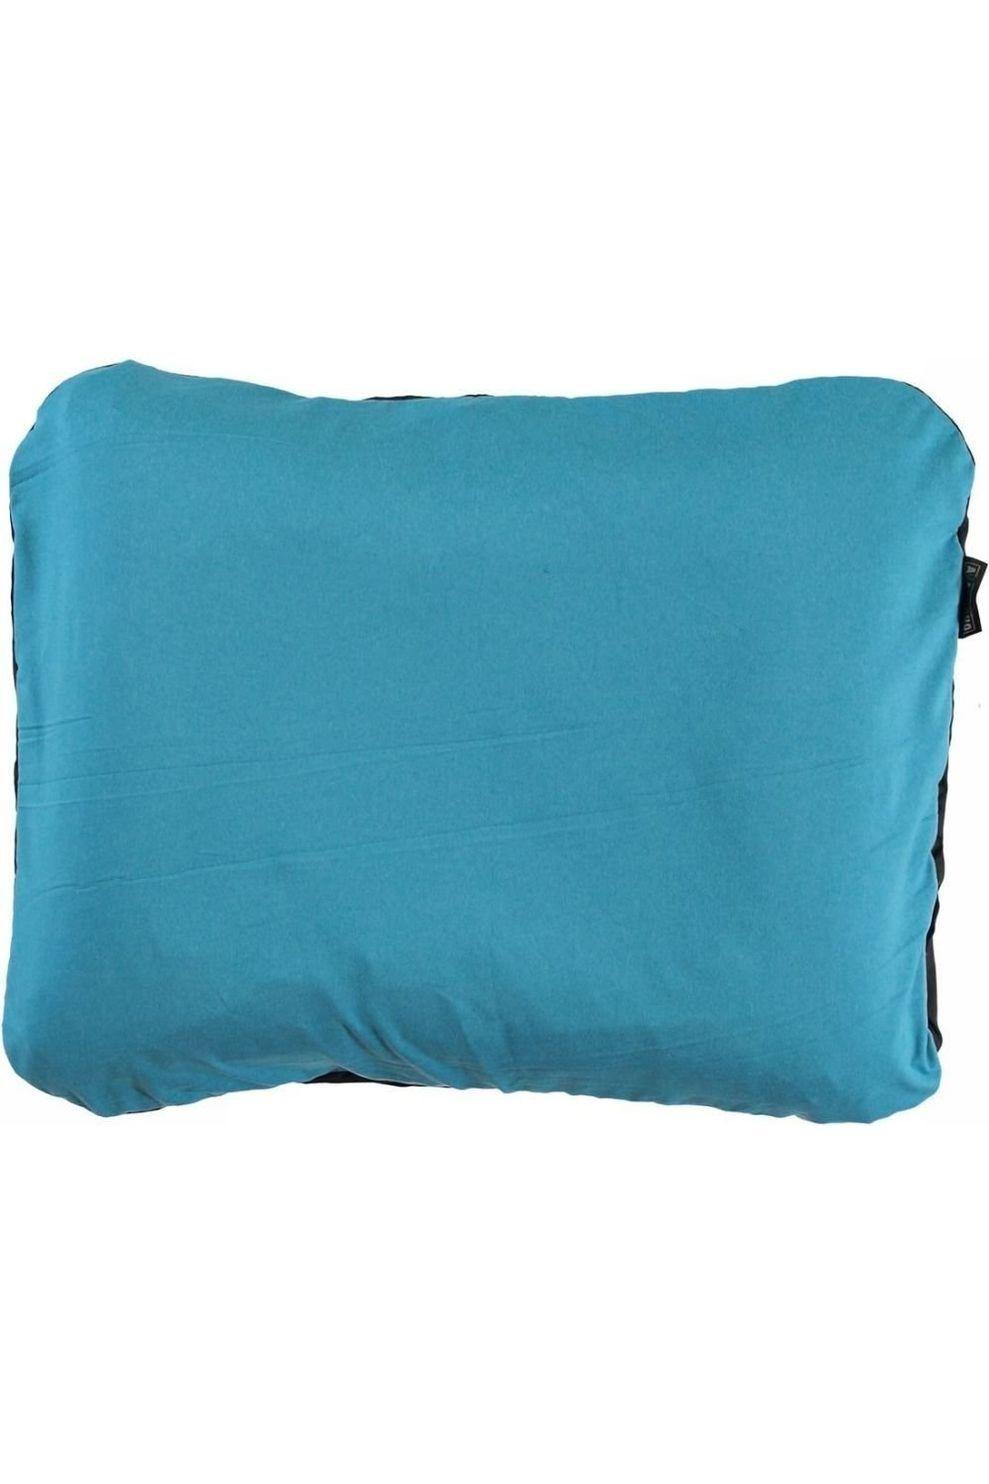 Ayacucho Kussen Travel Square Pillow - Blauw/Zwart